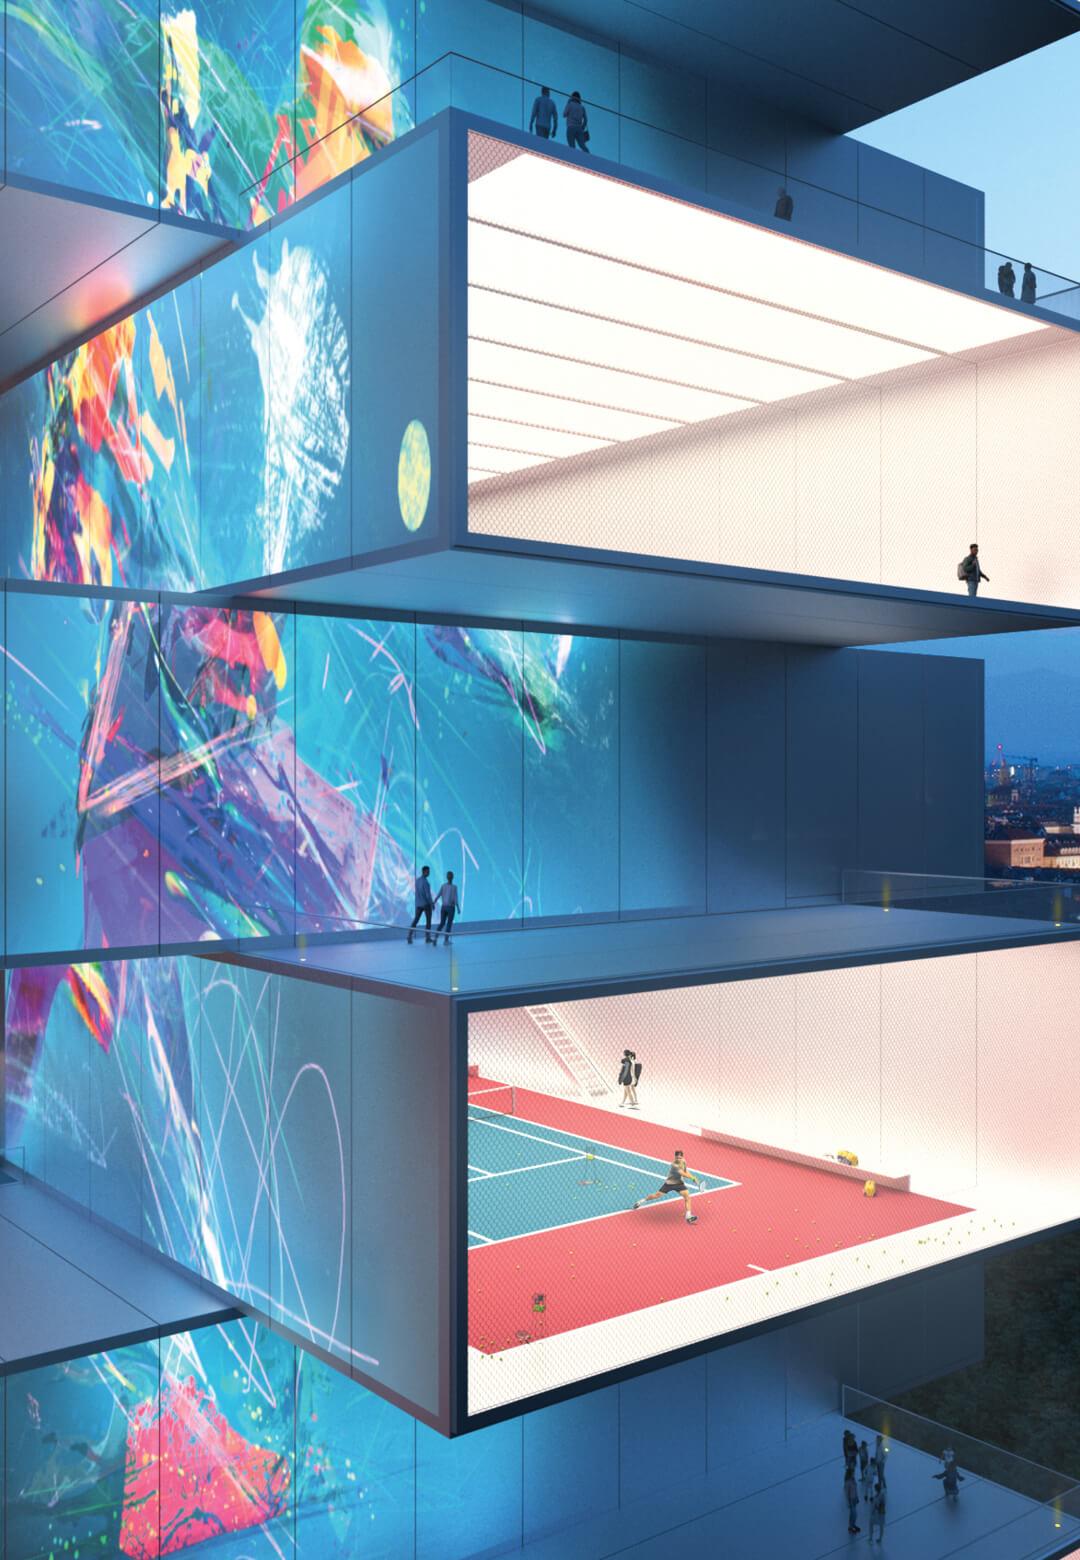 The Playscraper by Carlo Ratti Associati innovatively combines digital media display, sports entertainment, and prefab construction | Playscraper | Carlo Ratti Associati | STIRworld